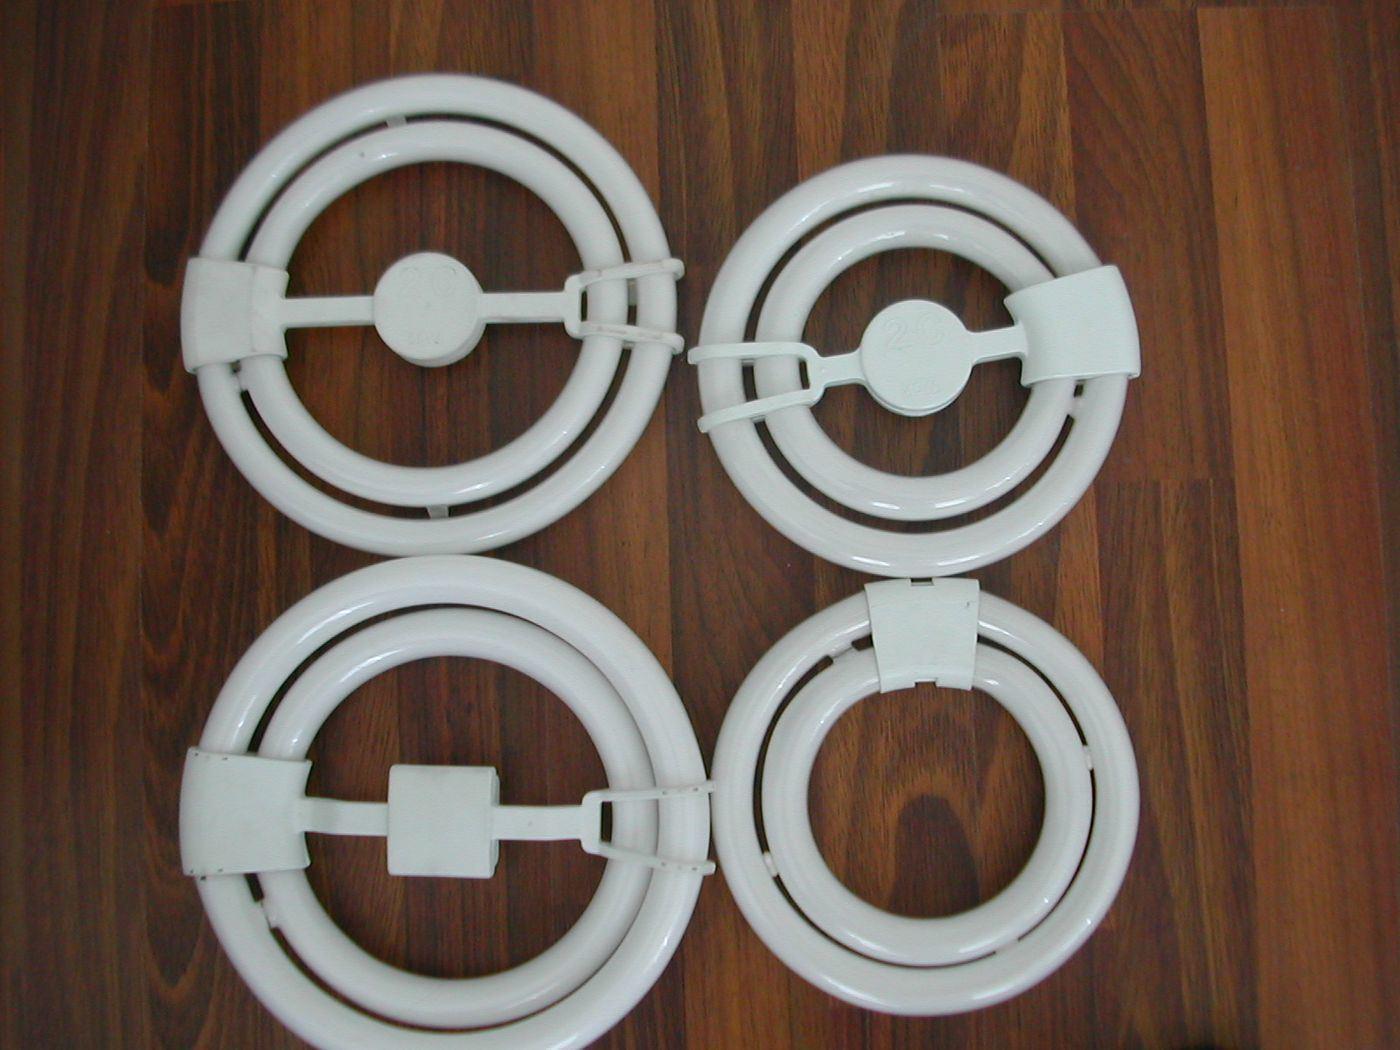 China T5 2c 55w Circle Fluorescent Tube 10000h Gr10q 220 240v Tc 2c 55w China 2c Circle Tube T5 2c 55w Fluorescent Tube